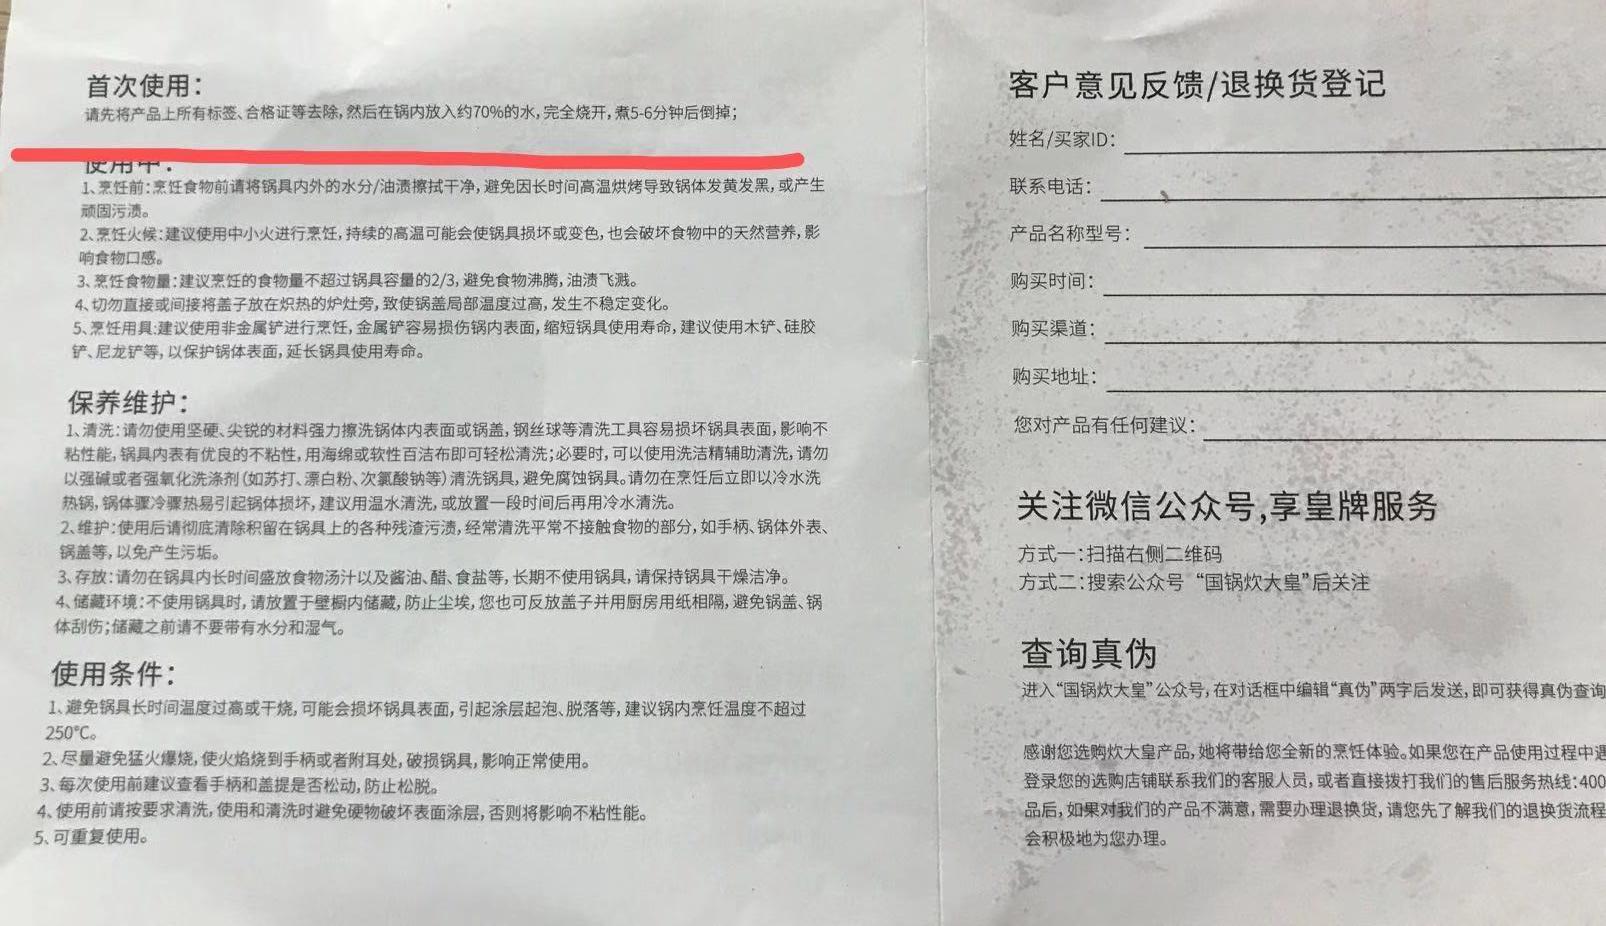 <b>李佳琦独家回应不粘锅直播翻车:没按说明书操作</b>